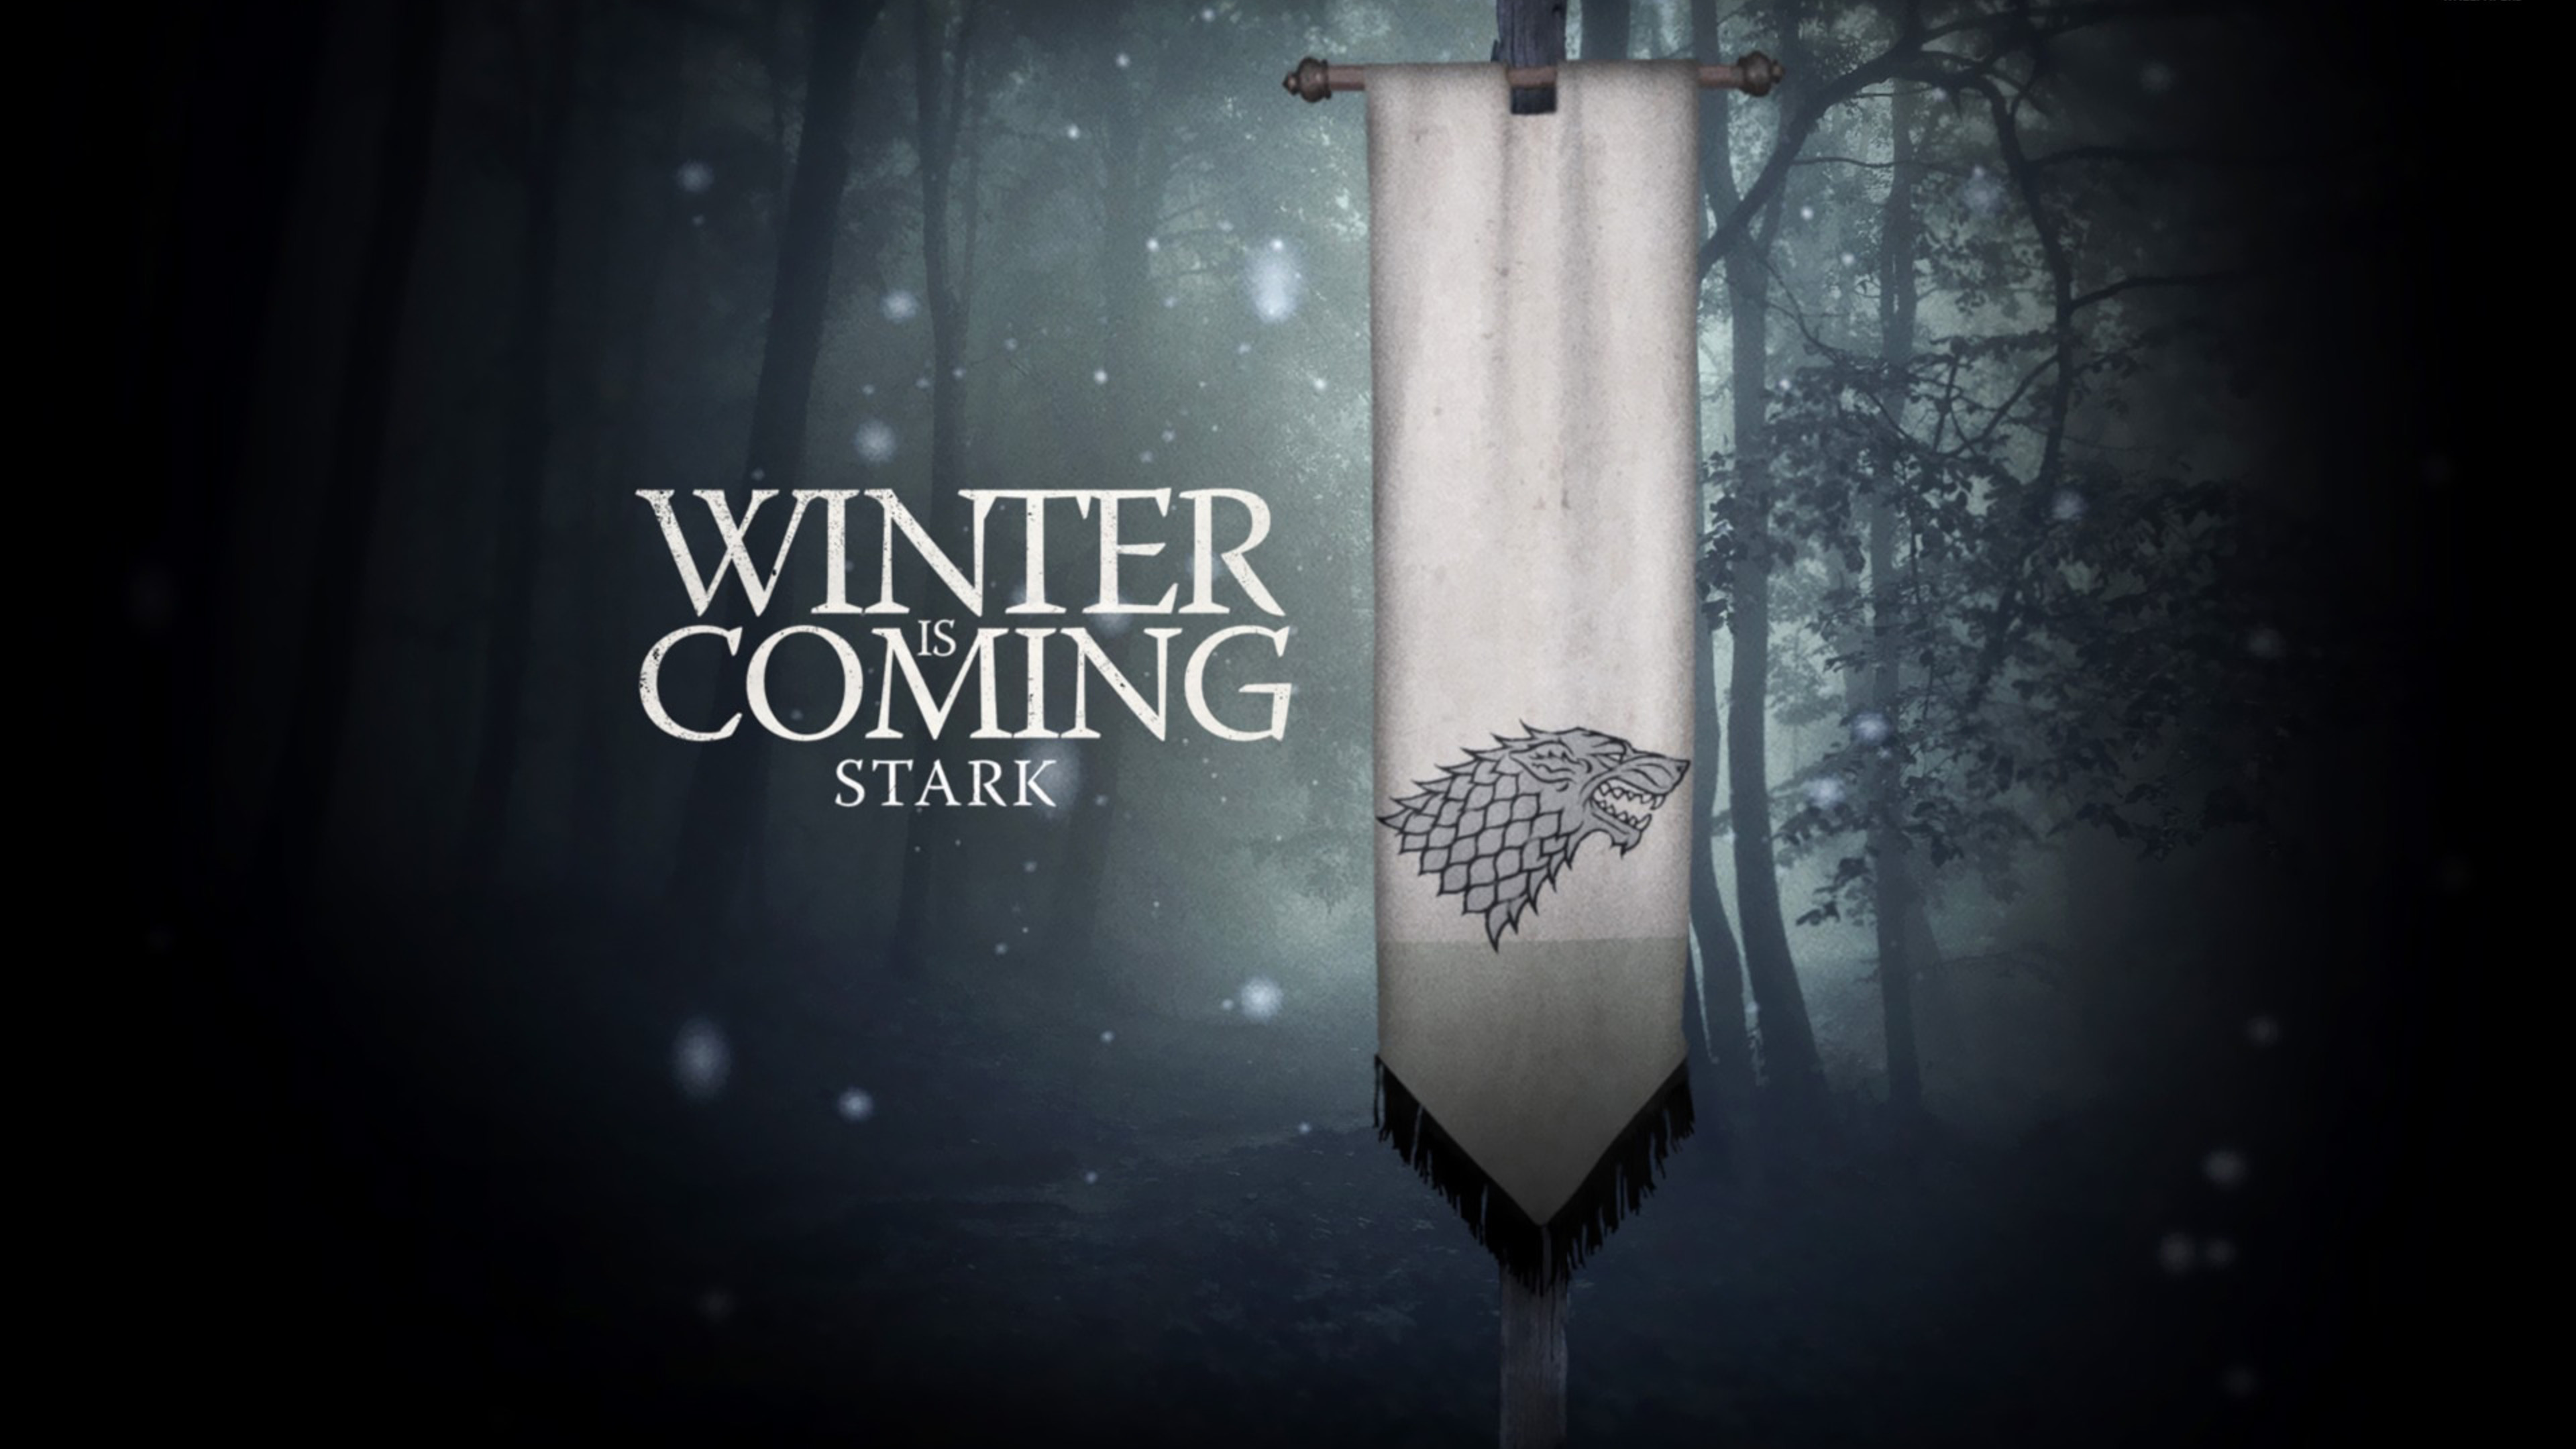 4k Game Of Thrones Wallpaper: 3840x2160 Winter Is Coming 4k HD 4k Wallpapers, Images